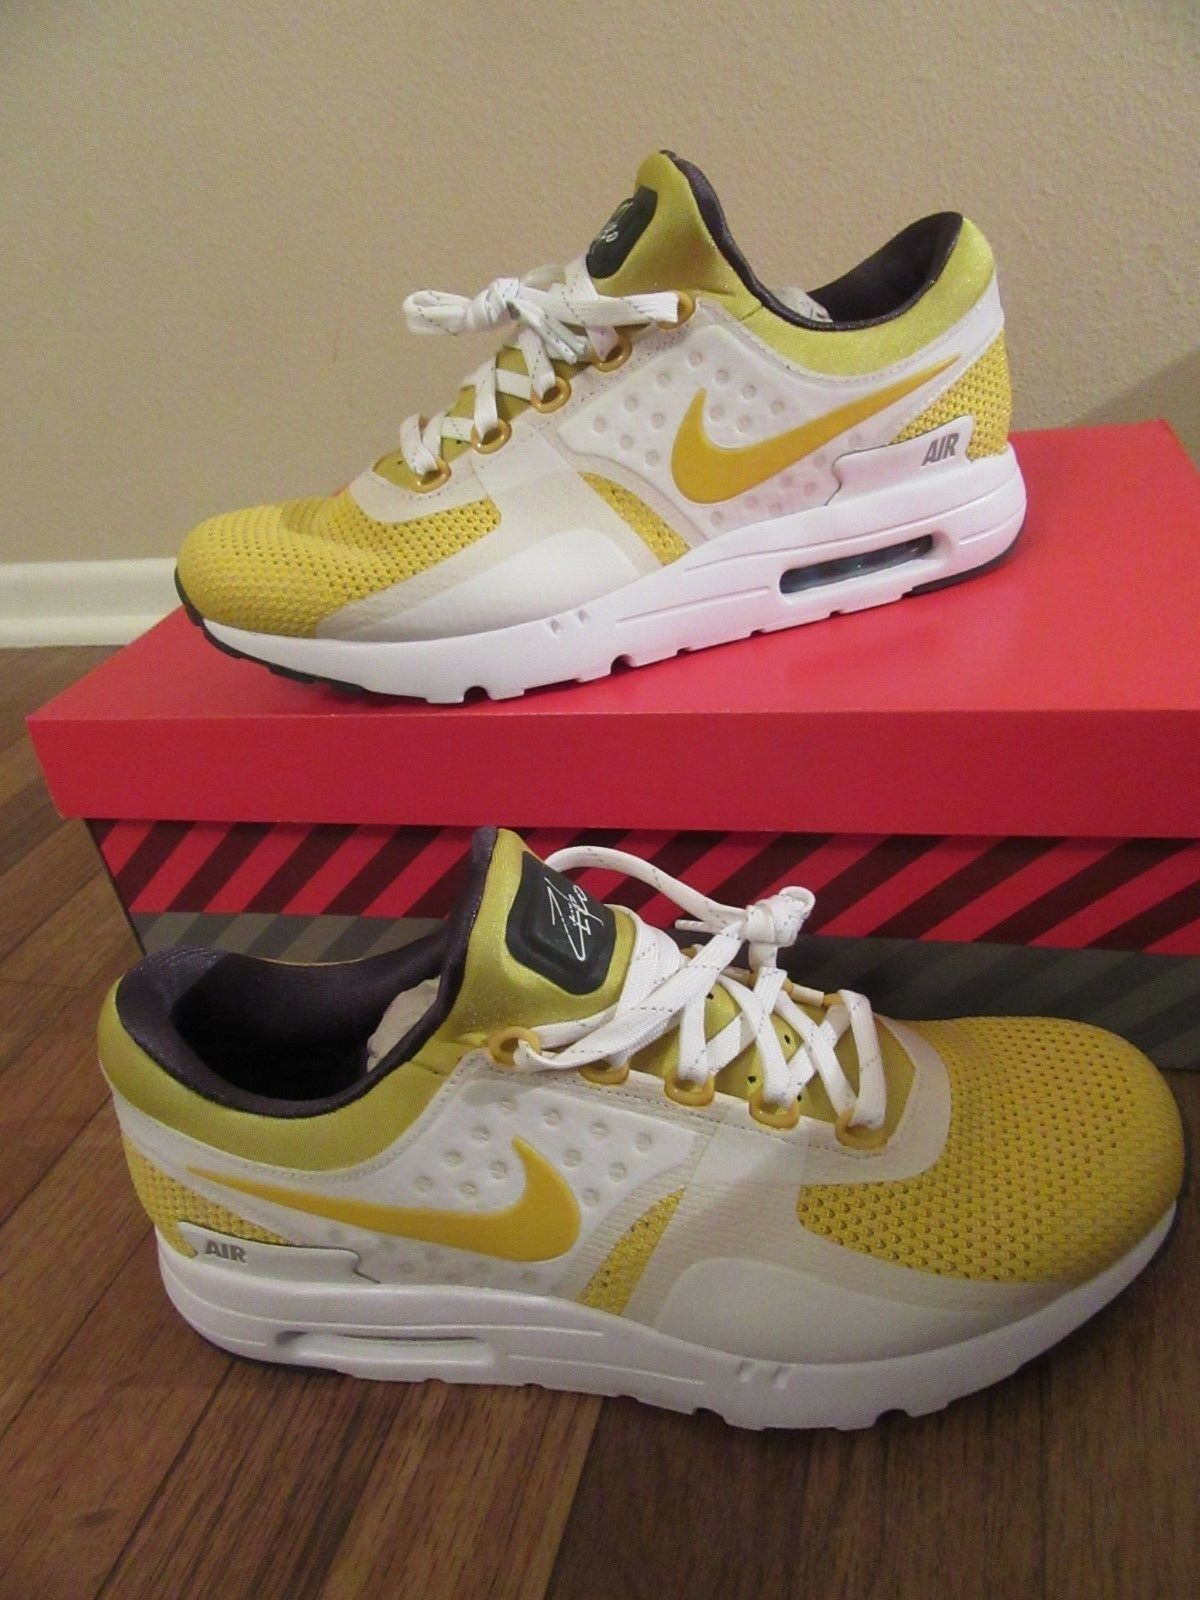 Nike Air Max Zero QS Size 11.5 White Yellow Tinker Hatfield 789695 100 New NIB